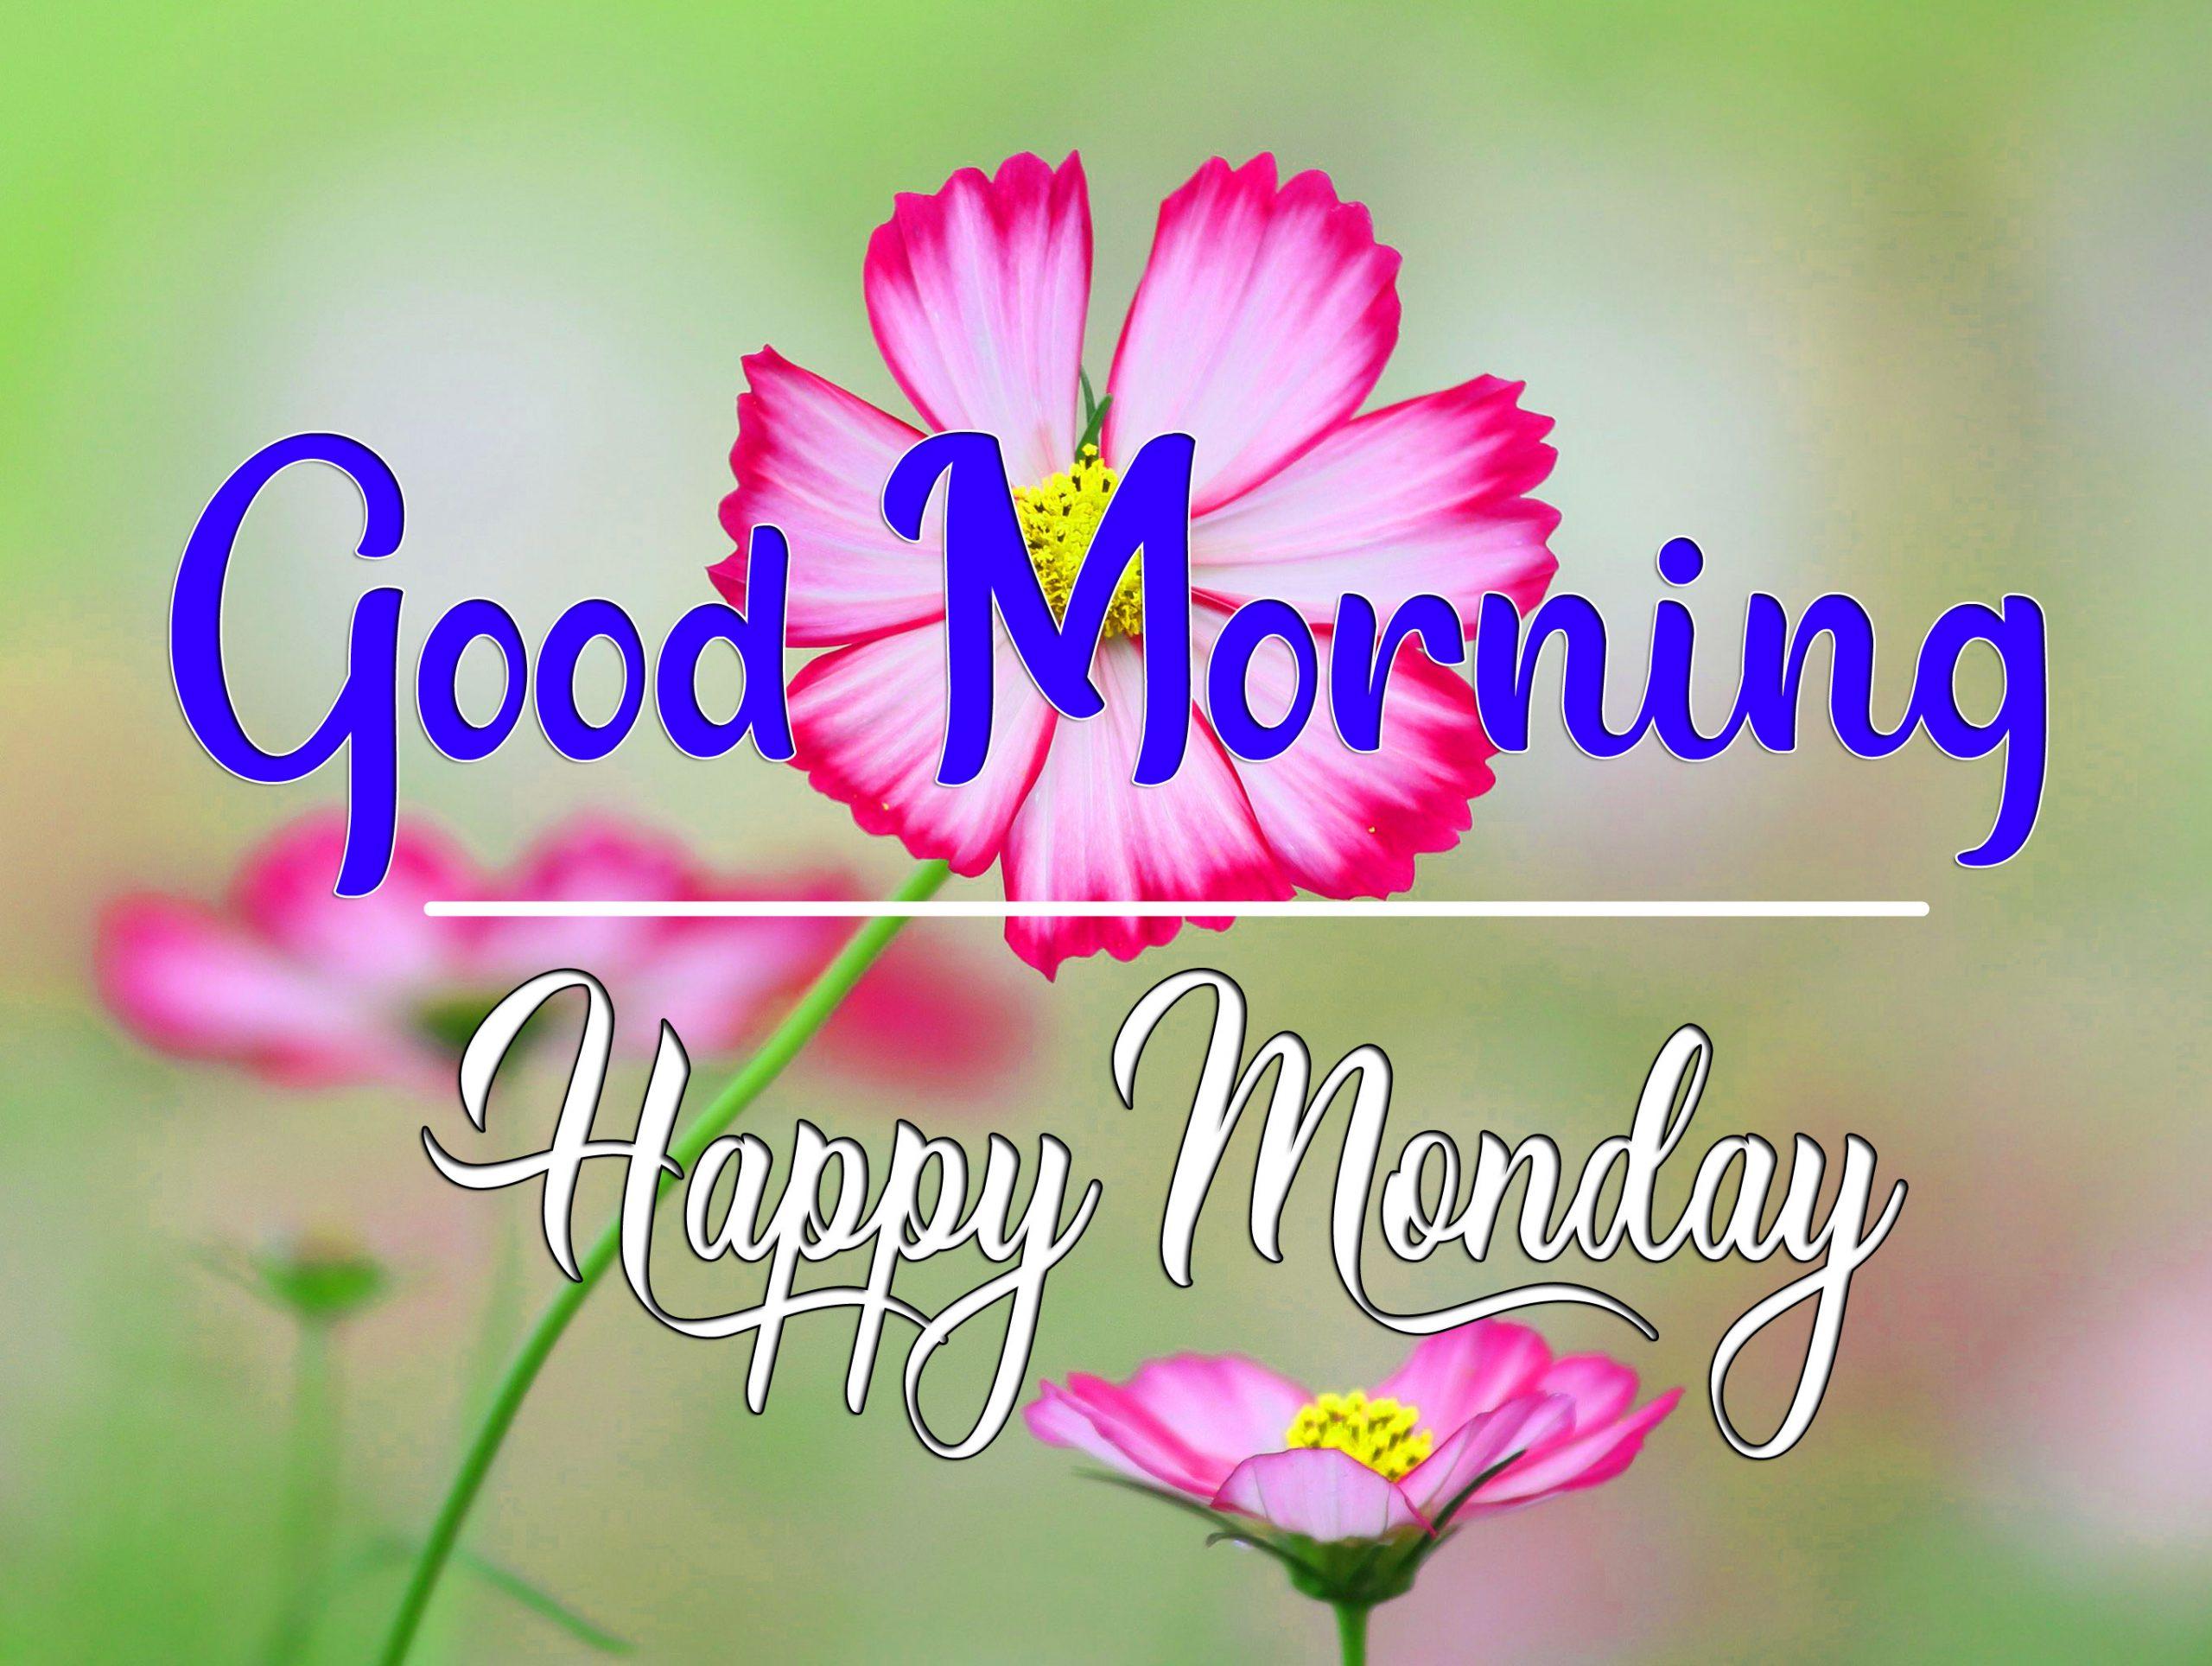 Monday Good Morning Pics Images 2021 1